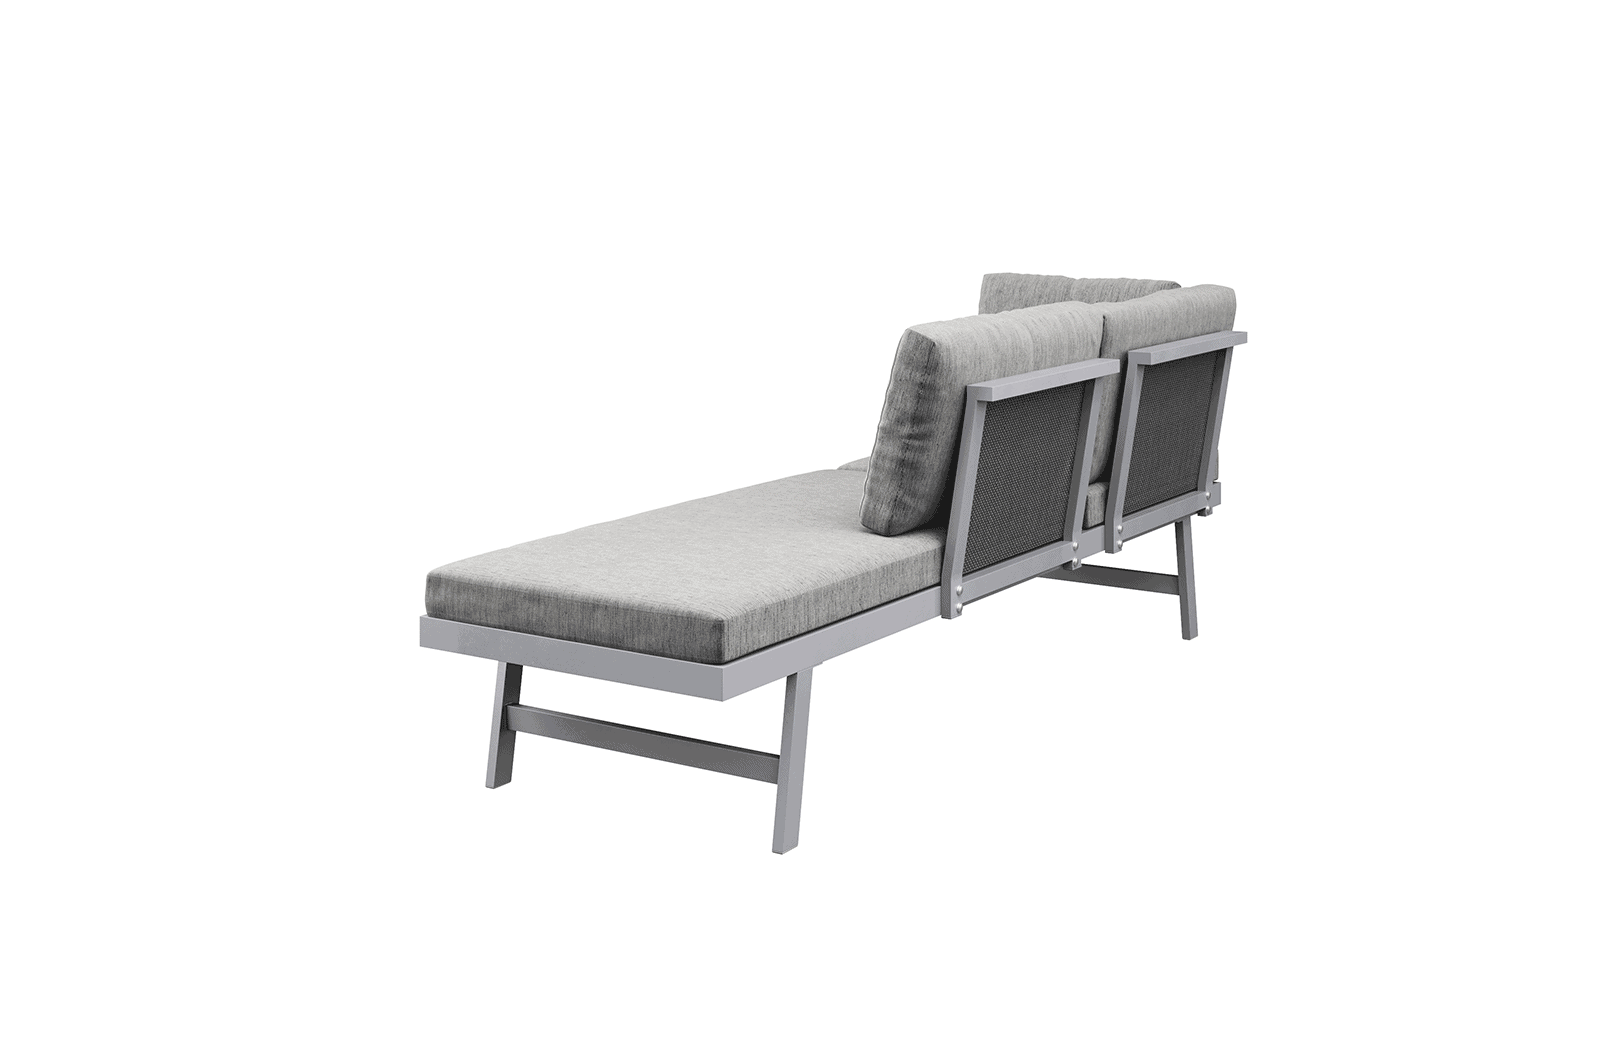 Meble ogrodowe MASCA grey